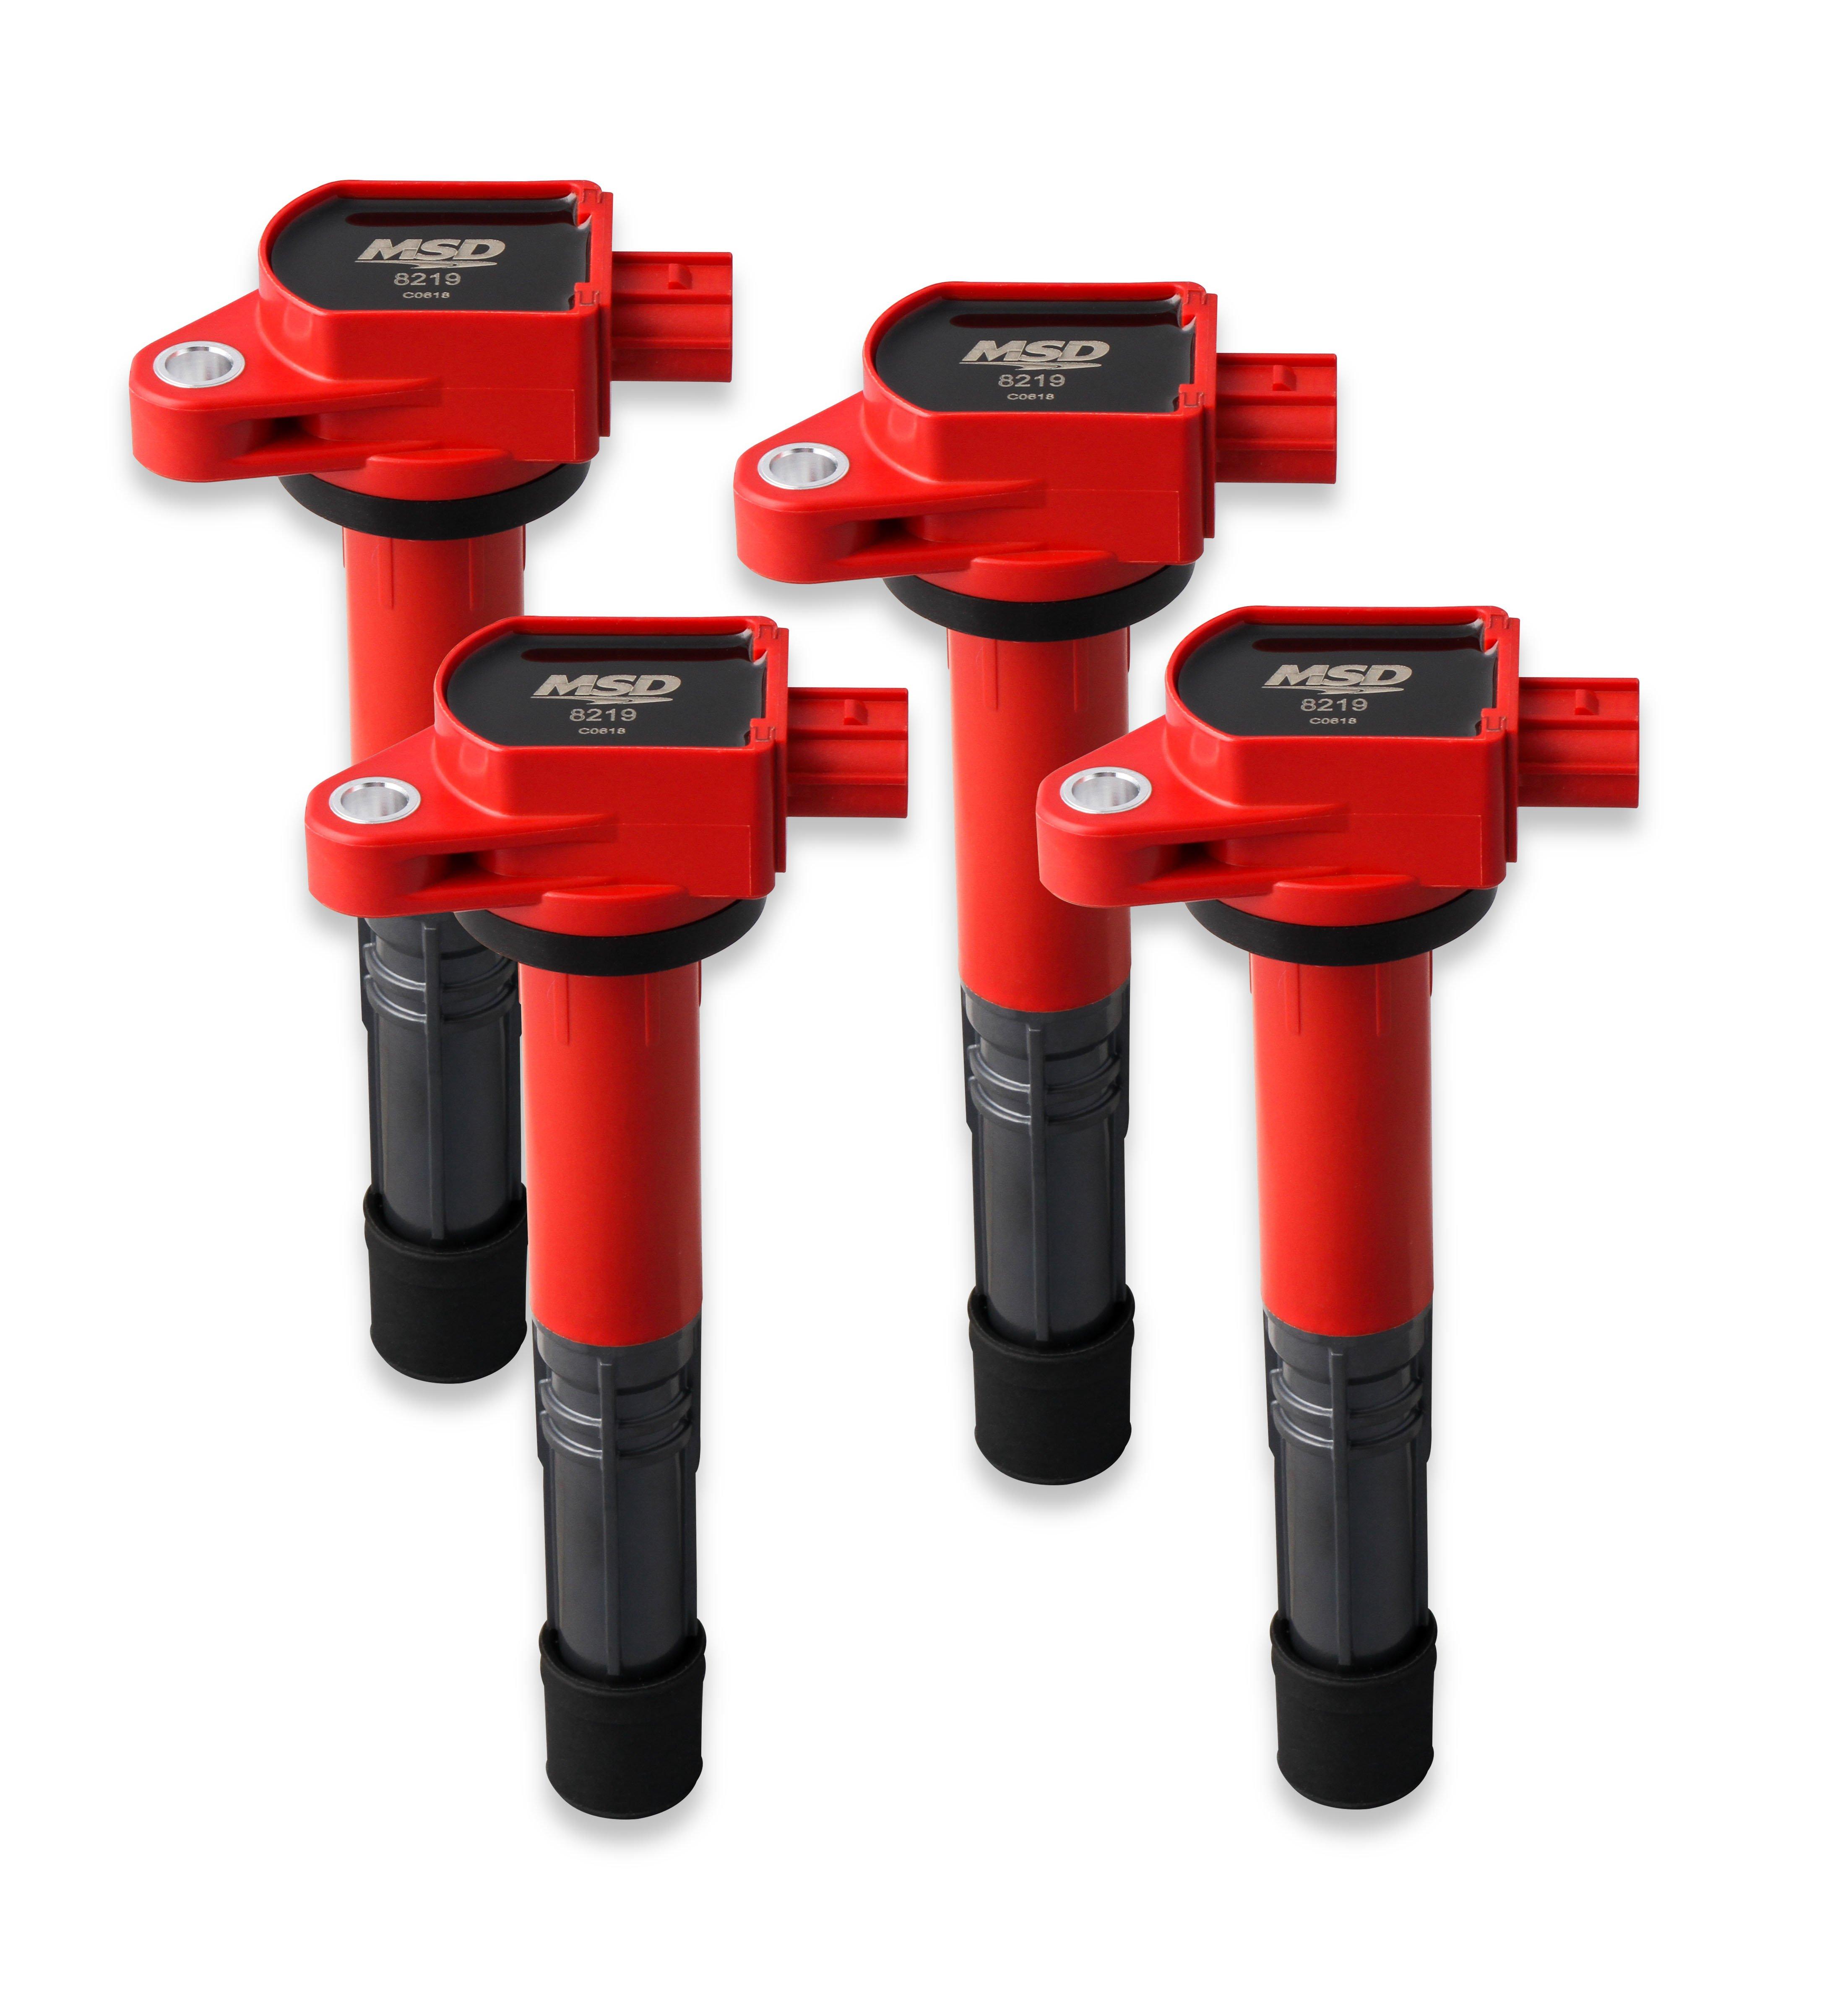 MSD 82194 Blaster Coil, 08-17 Honda/Acura 2.4L, Red , 4-Pack